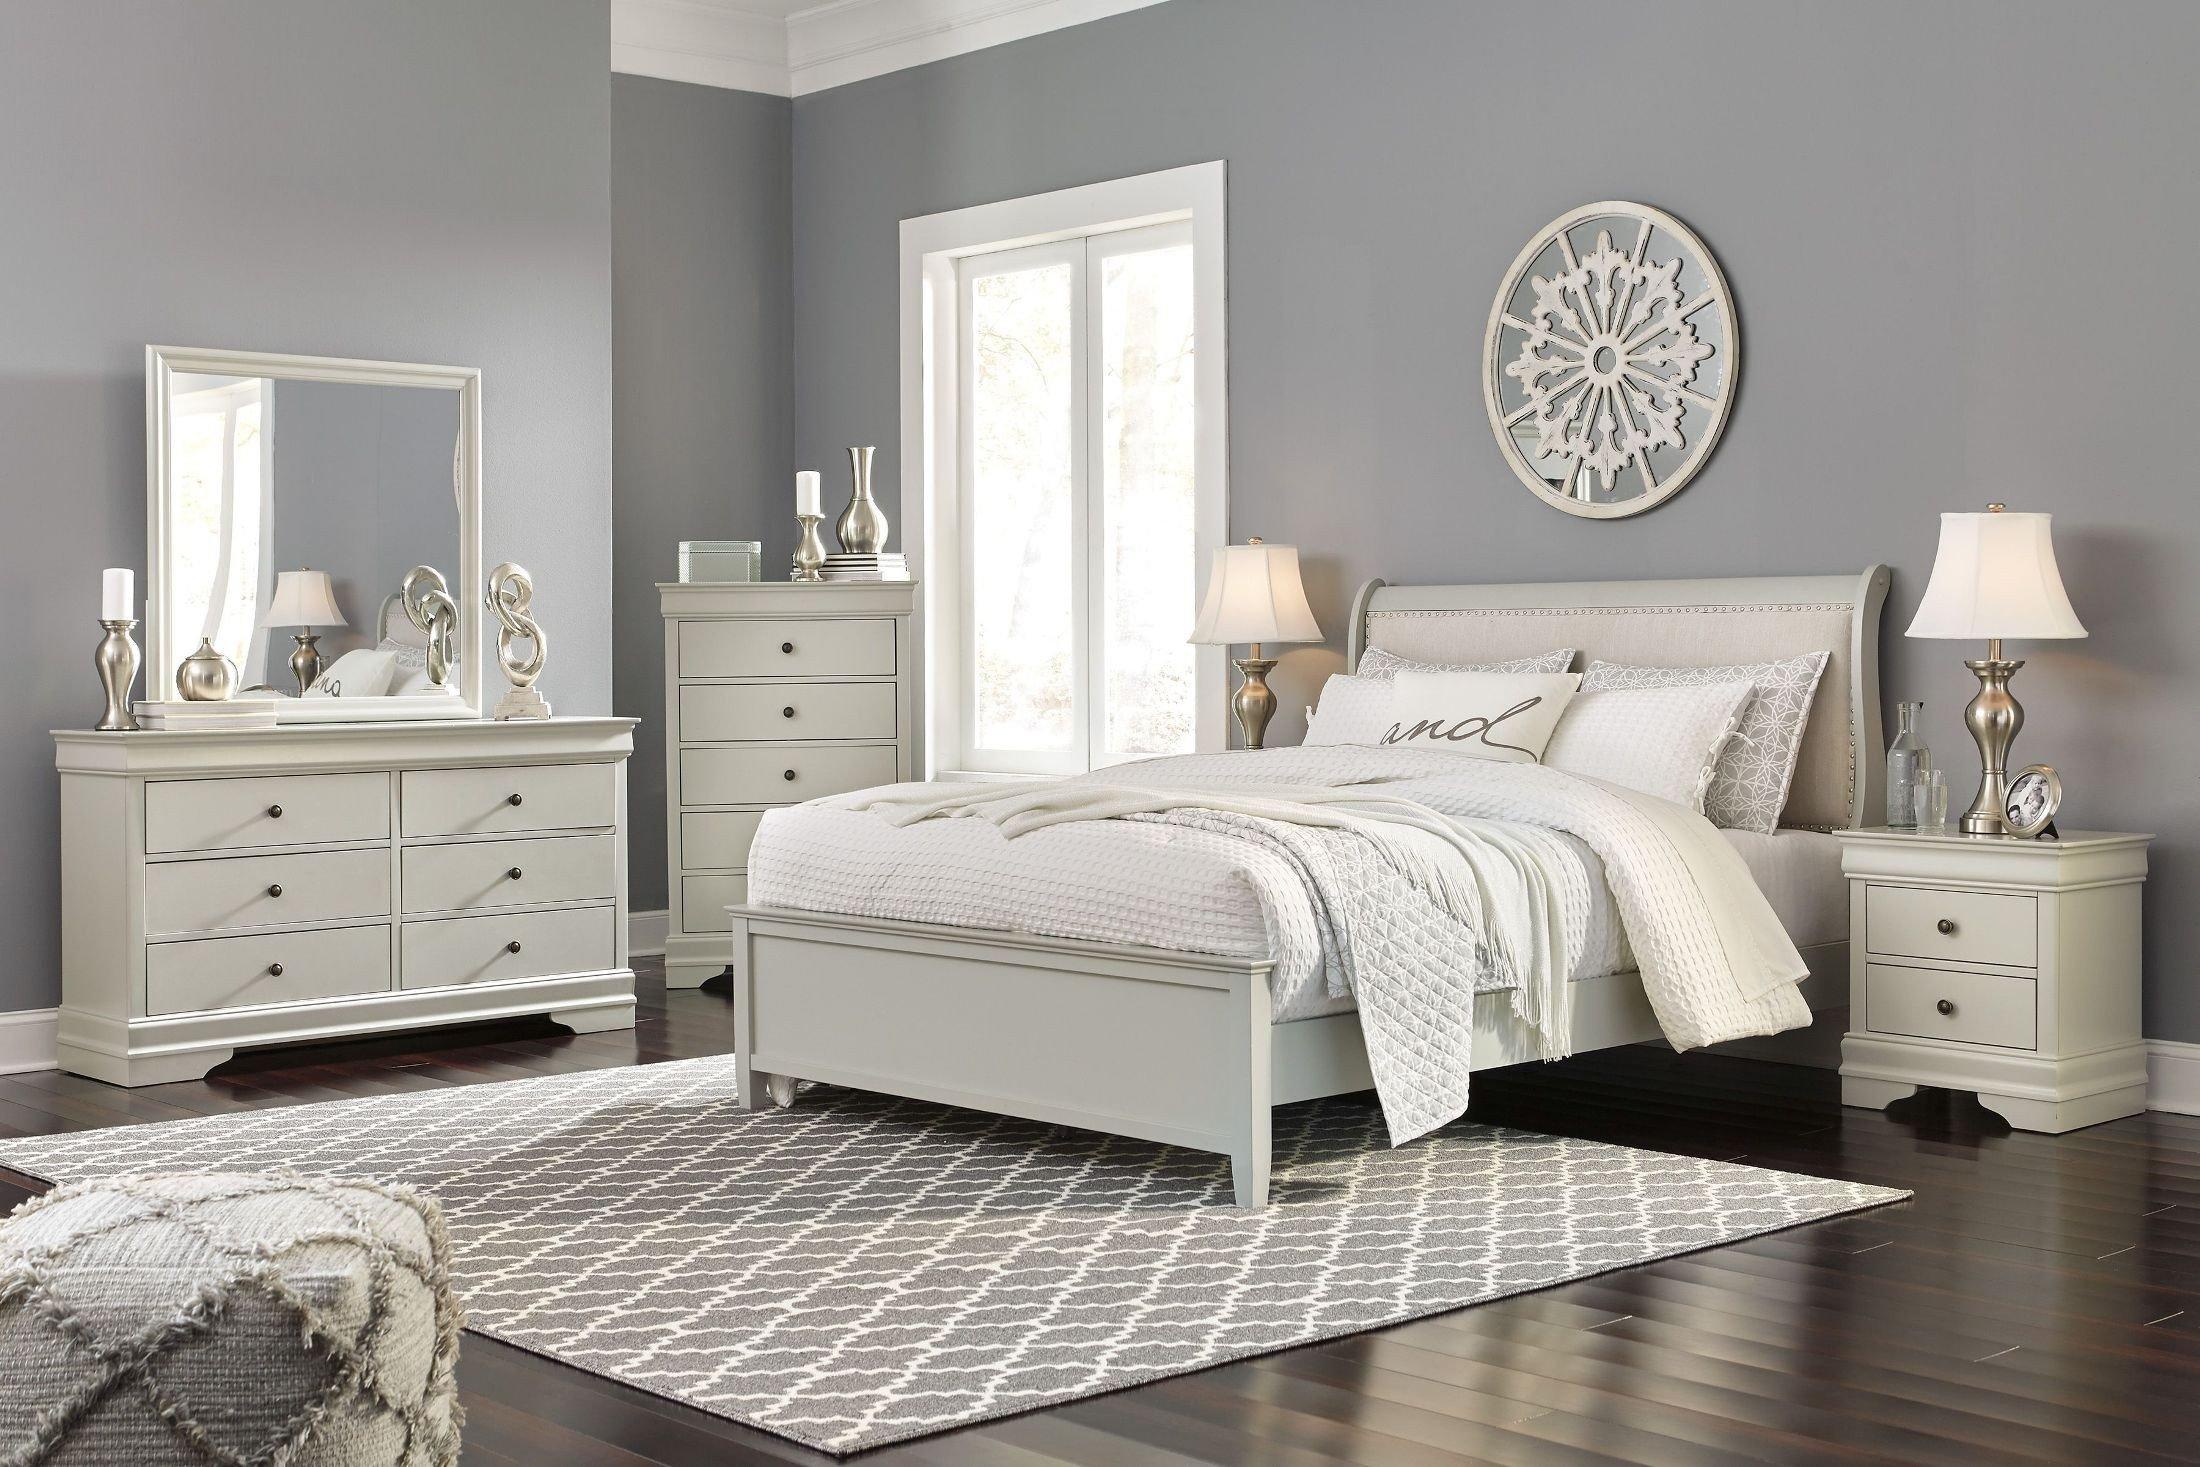 Ashley Furniture Silver Bedroom Set Elegant Emma Mason Signature Jarred 5 Piece Sleigh Bedroom Set In Gray